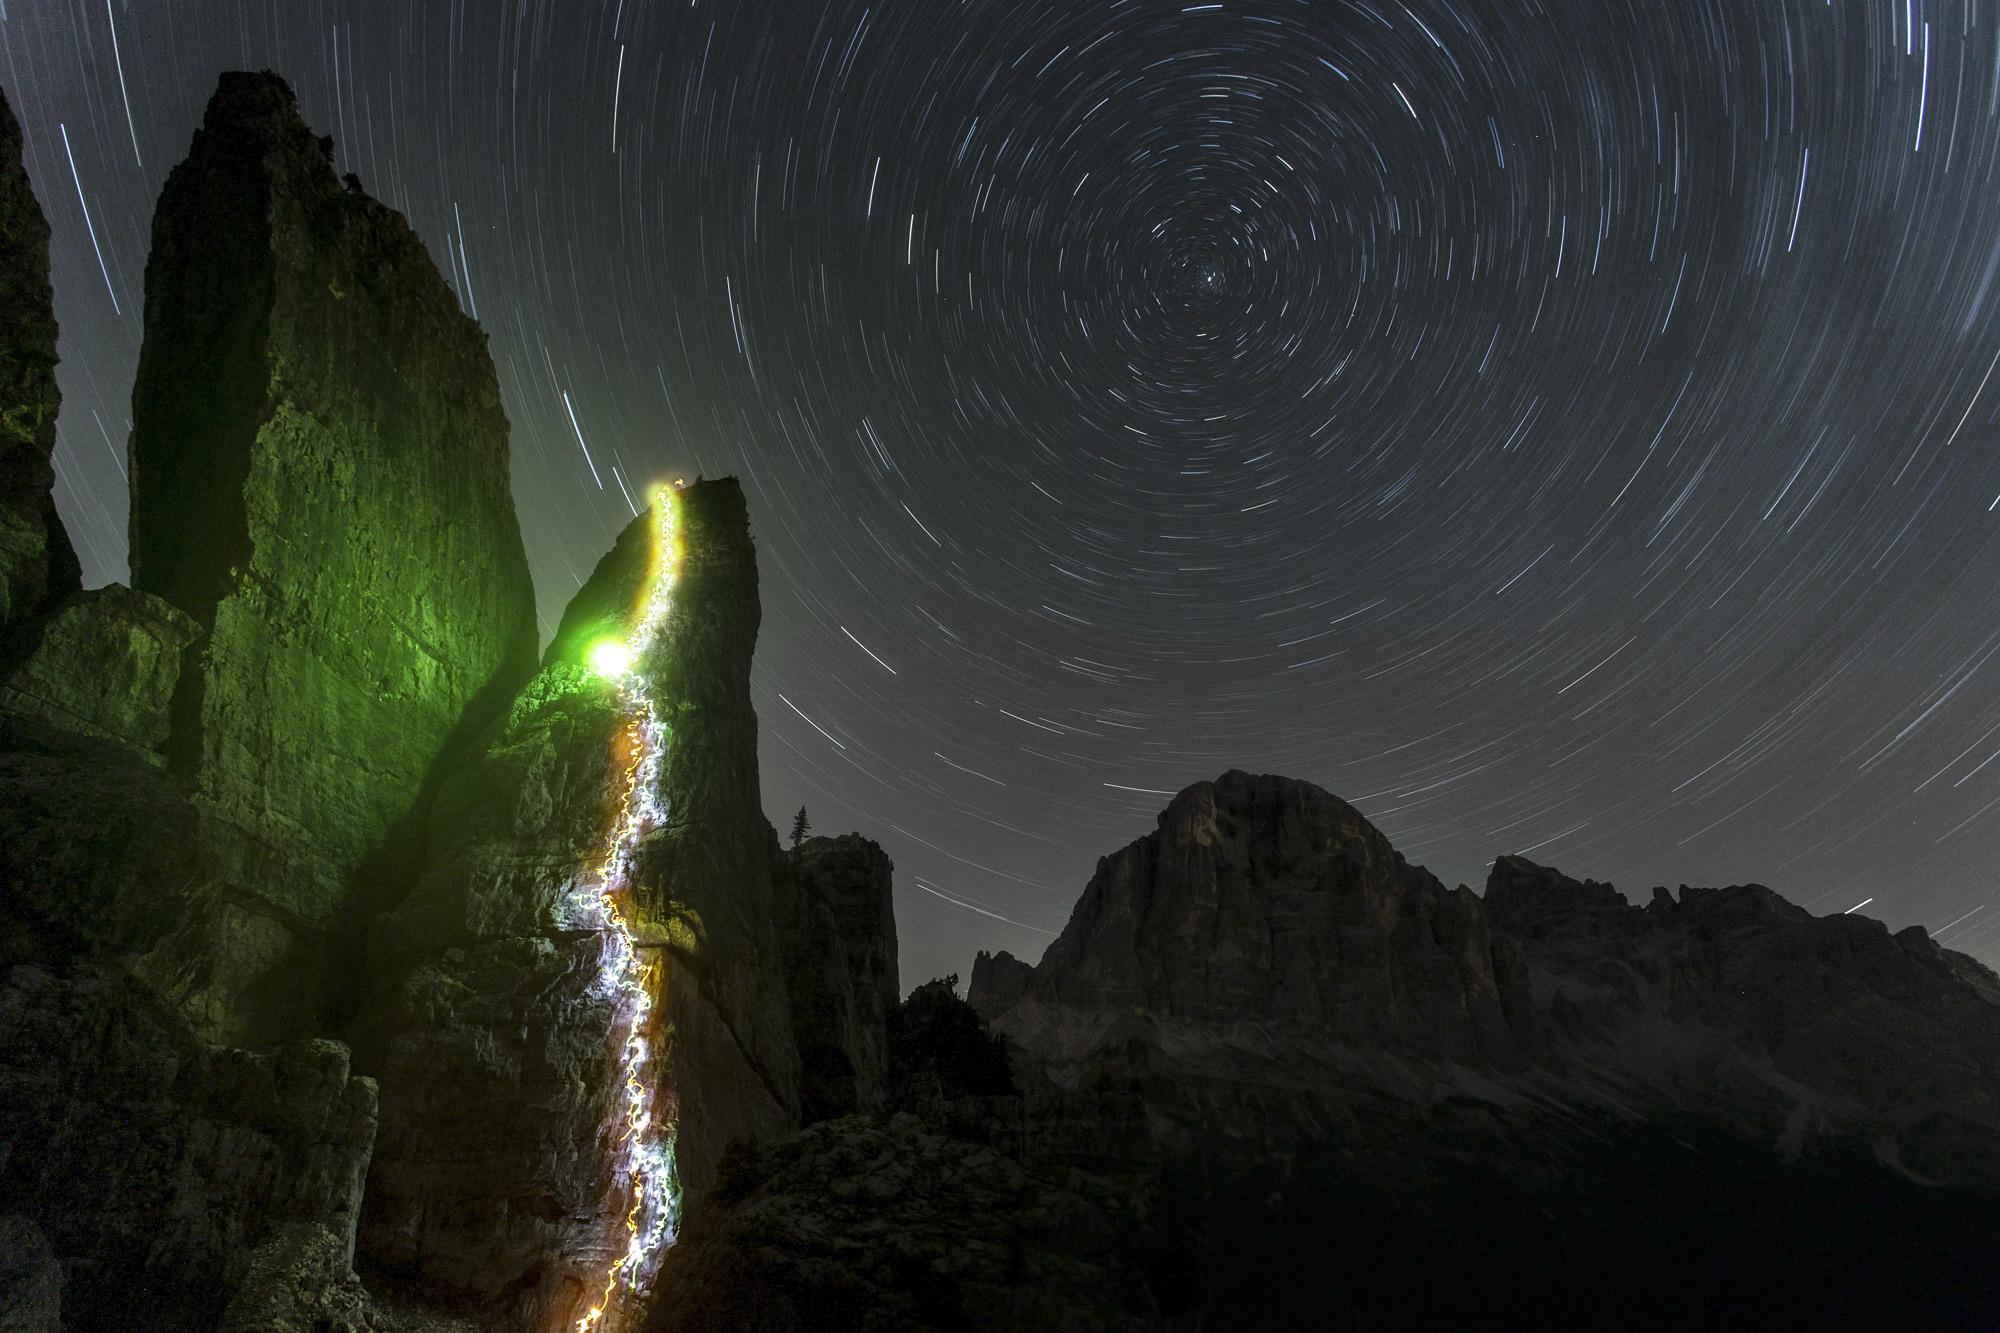 Patrick Deacon and Lynne Hempton making a night ascent of Torre Quarta Bassa. Nikon D610, 16-35mm at 16mm, ISO 100, 36 mins at f/5.6, tripod, September. ©James Rushforth